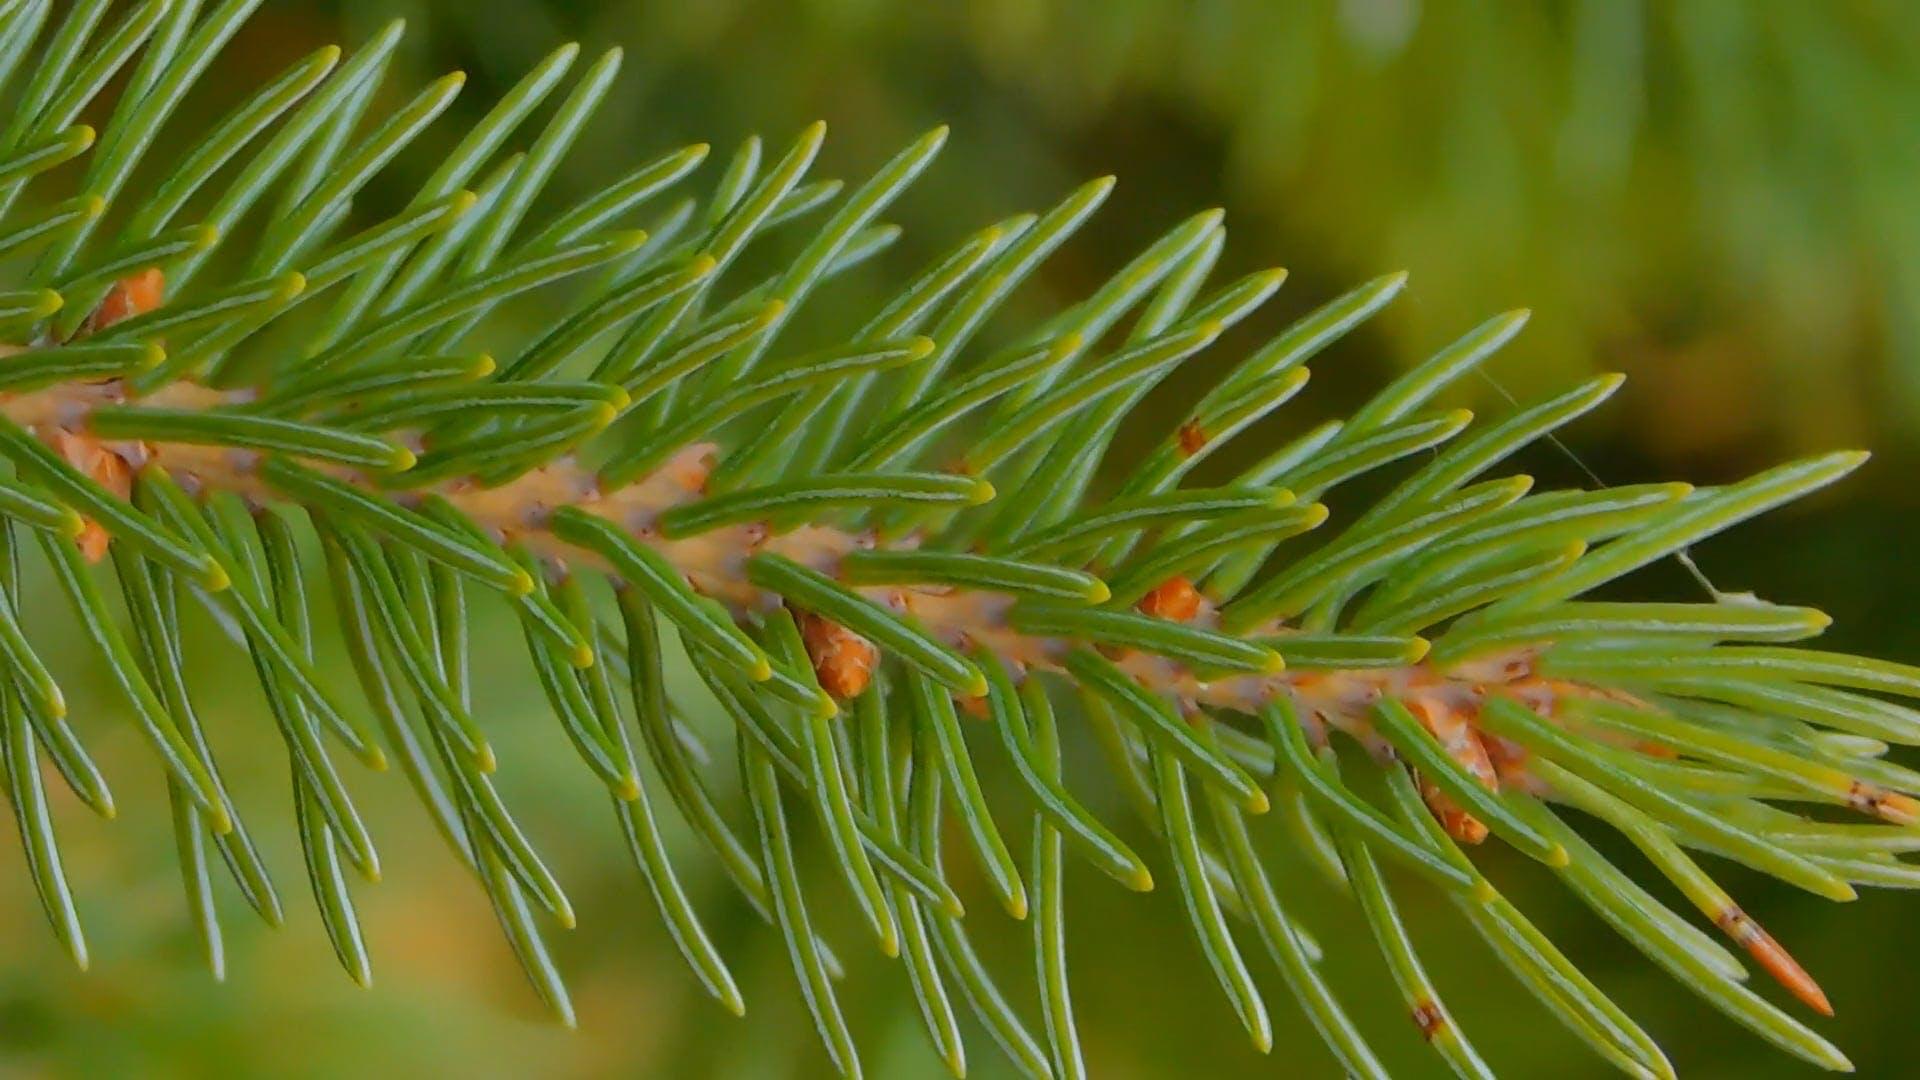 Close-up Shot Of Pine Tree